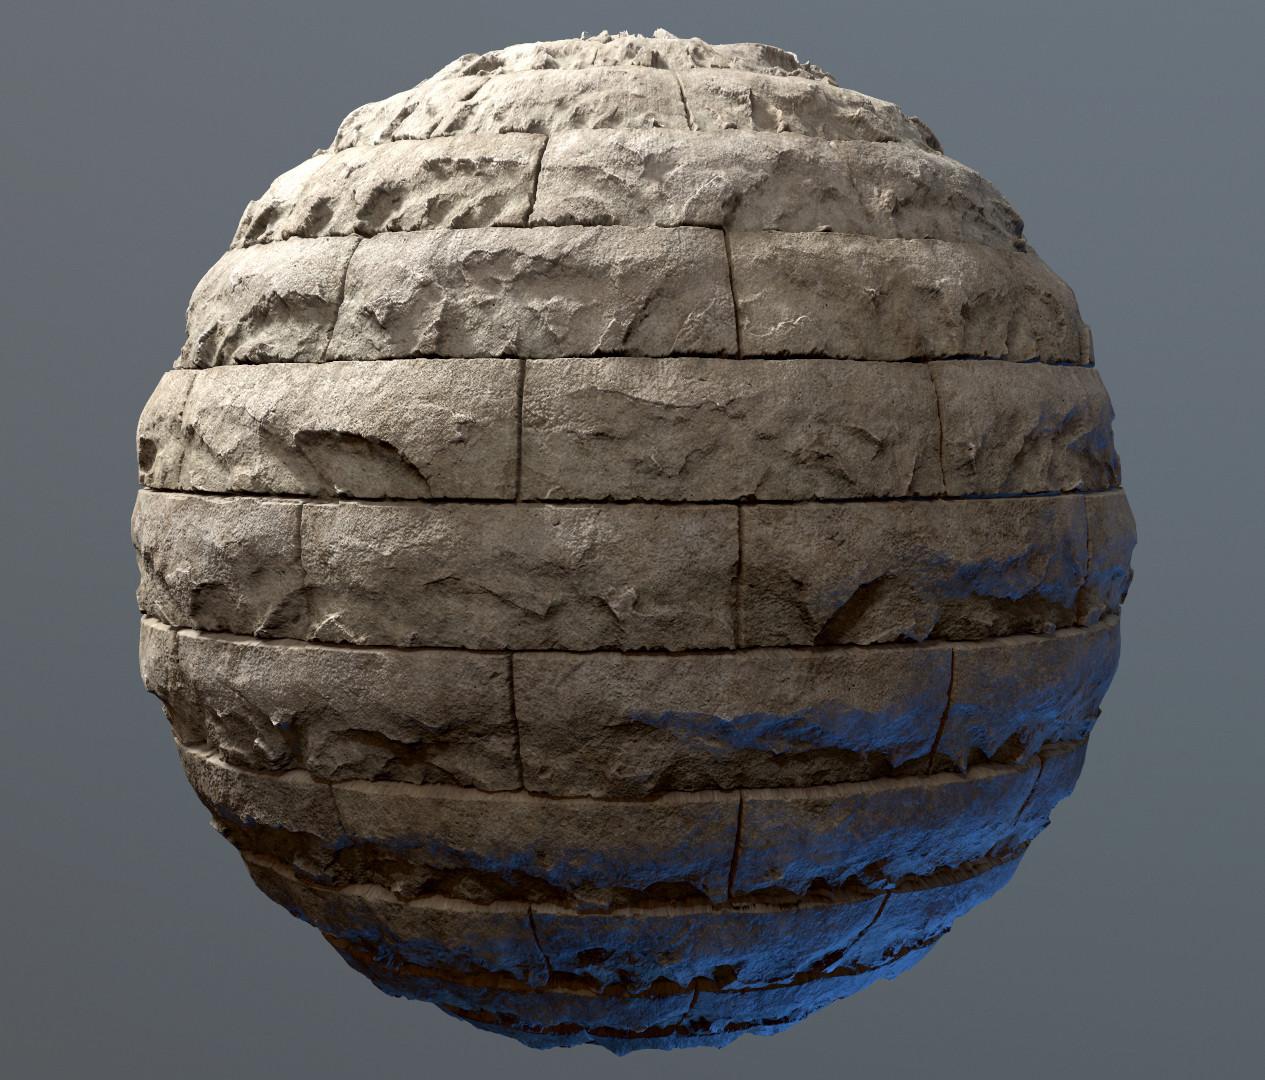 Kurt kupser textures 0003a 0000 stone hewn 1